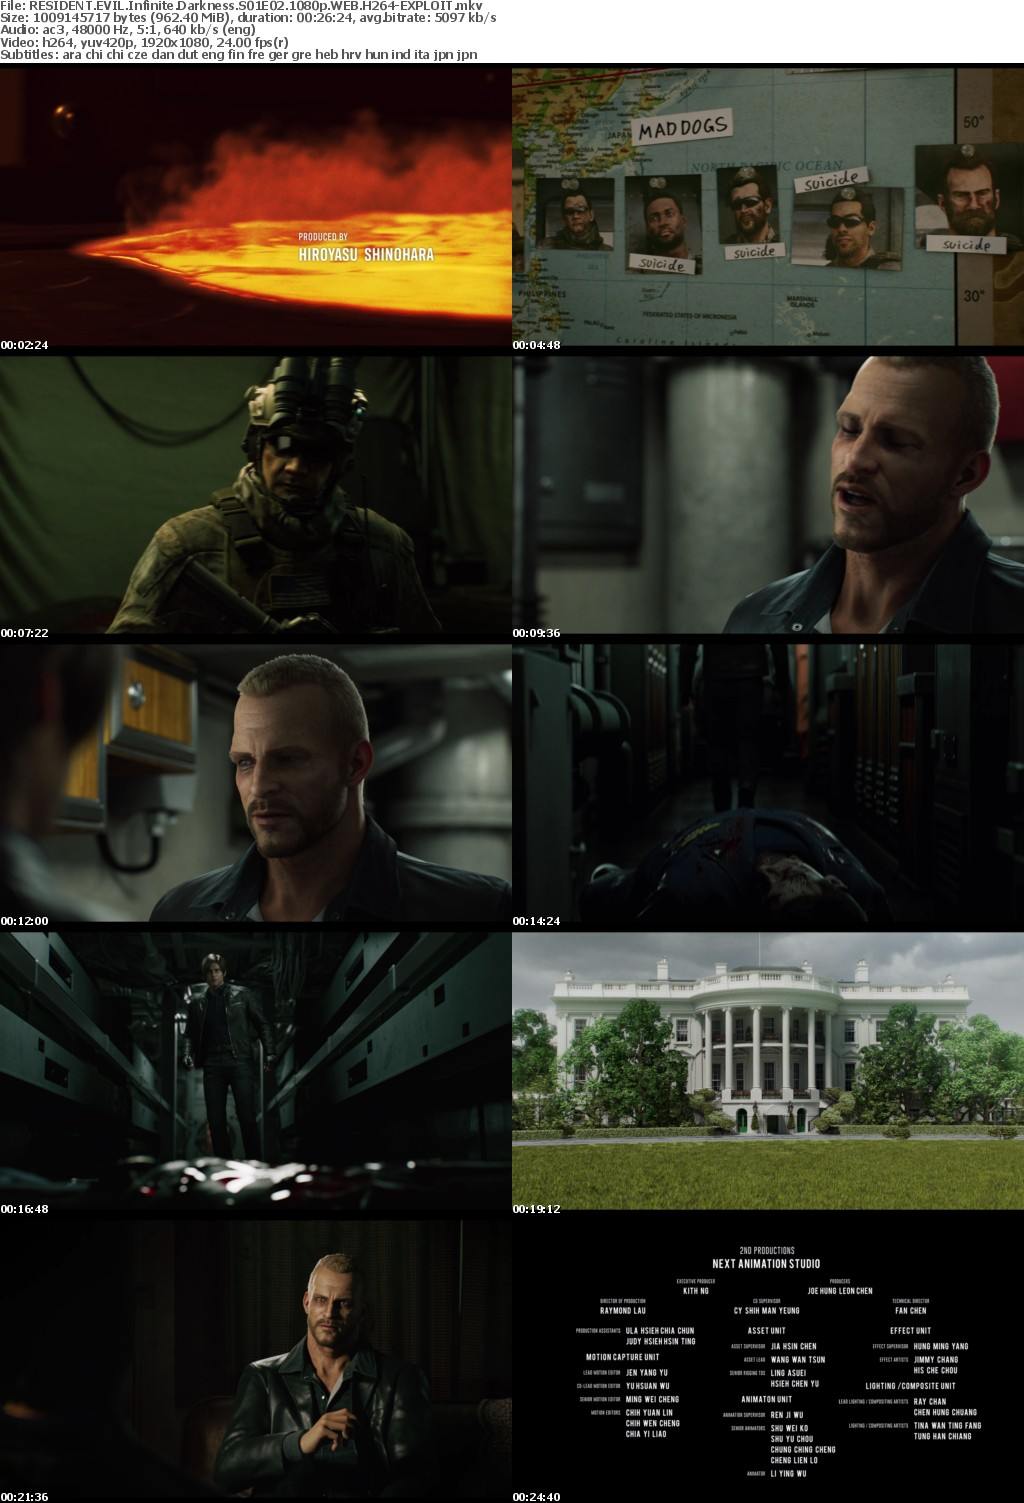 RESIDENT EVIL Infinite Darkness S01 COMPLETE 1080p NF WEB H264-EXPLOIT